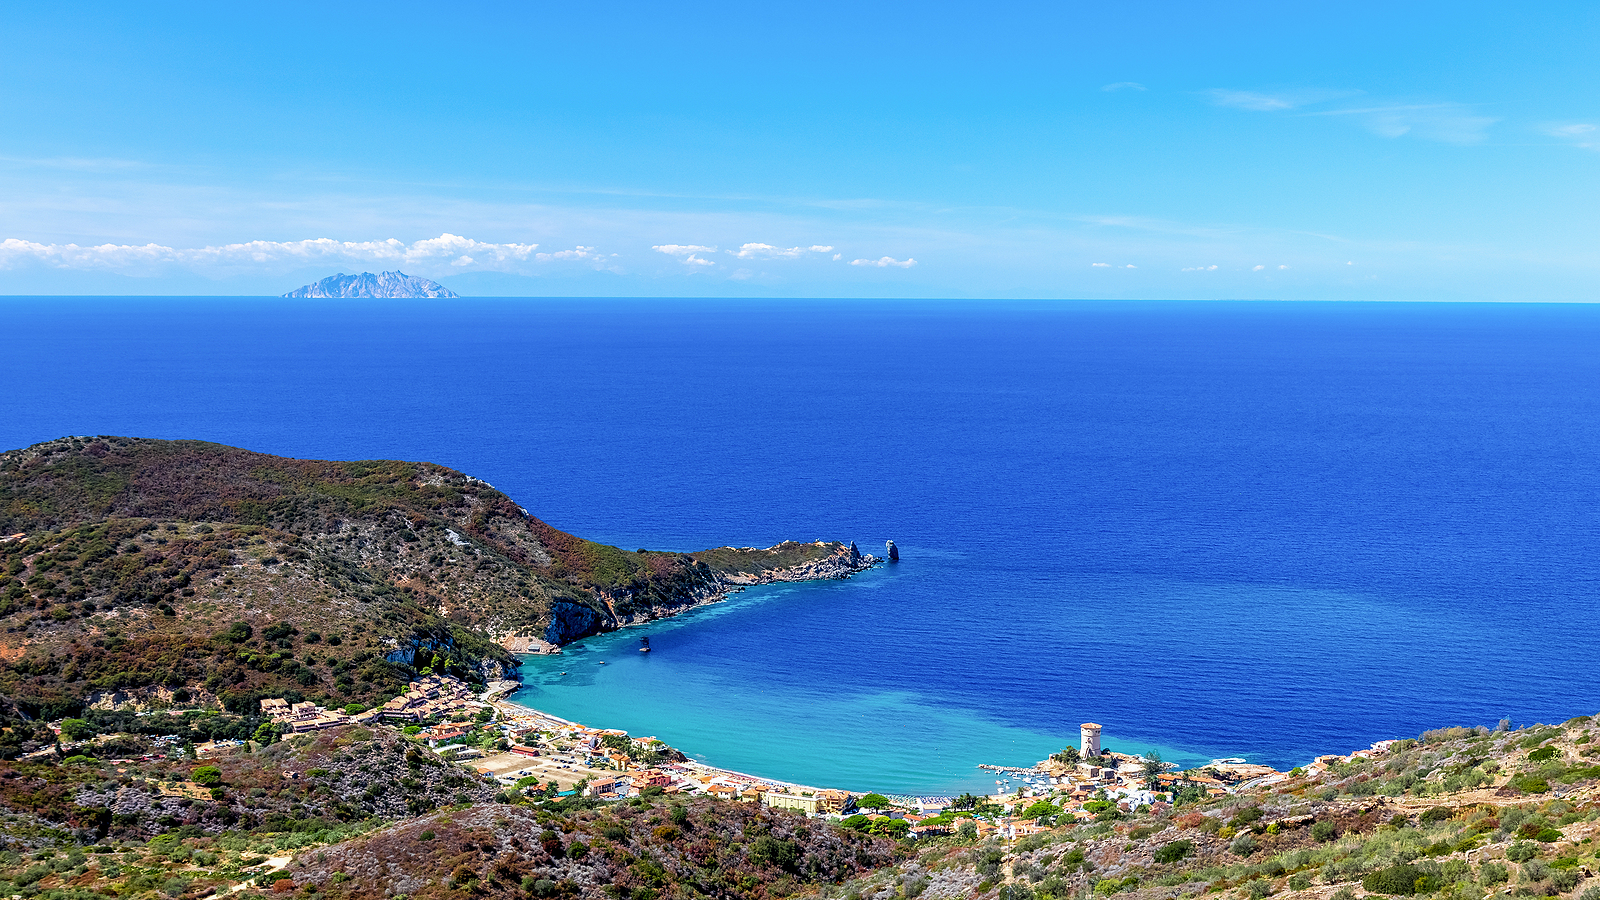 Giglio Island, Tuscany Beautiful Seascape and Beach www.njcharters.com